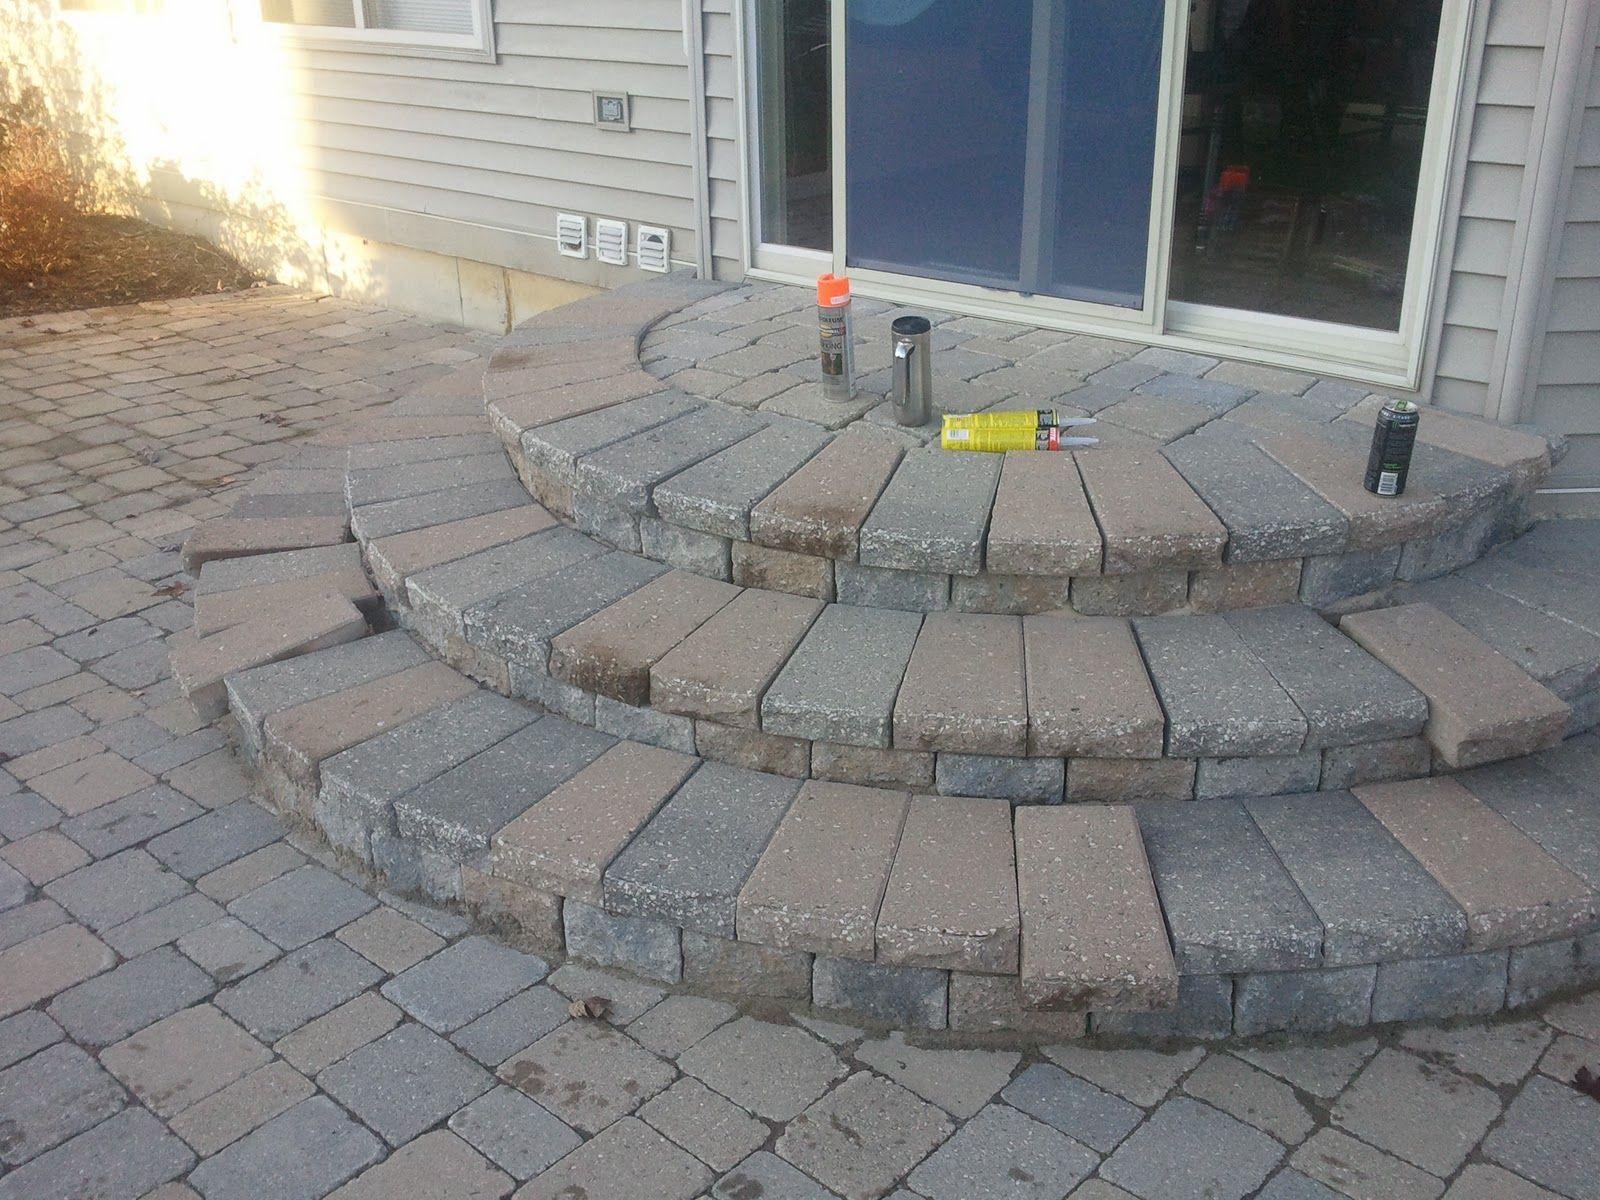 brick pavers CantonPlymouthNorthvillepatioRepairCleaningSealing & brick pavers CantonPlymouthNorthvillepatioRepairCleaning ...